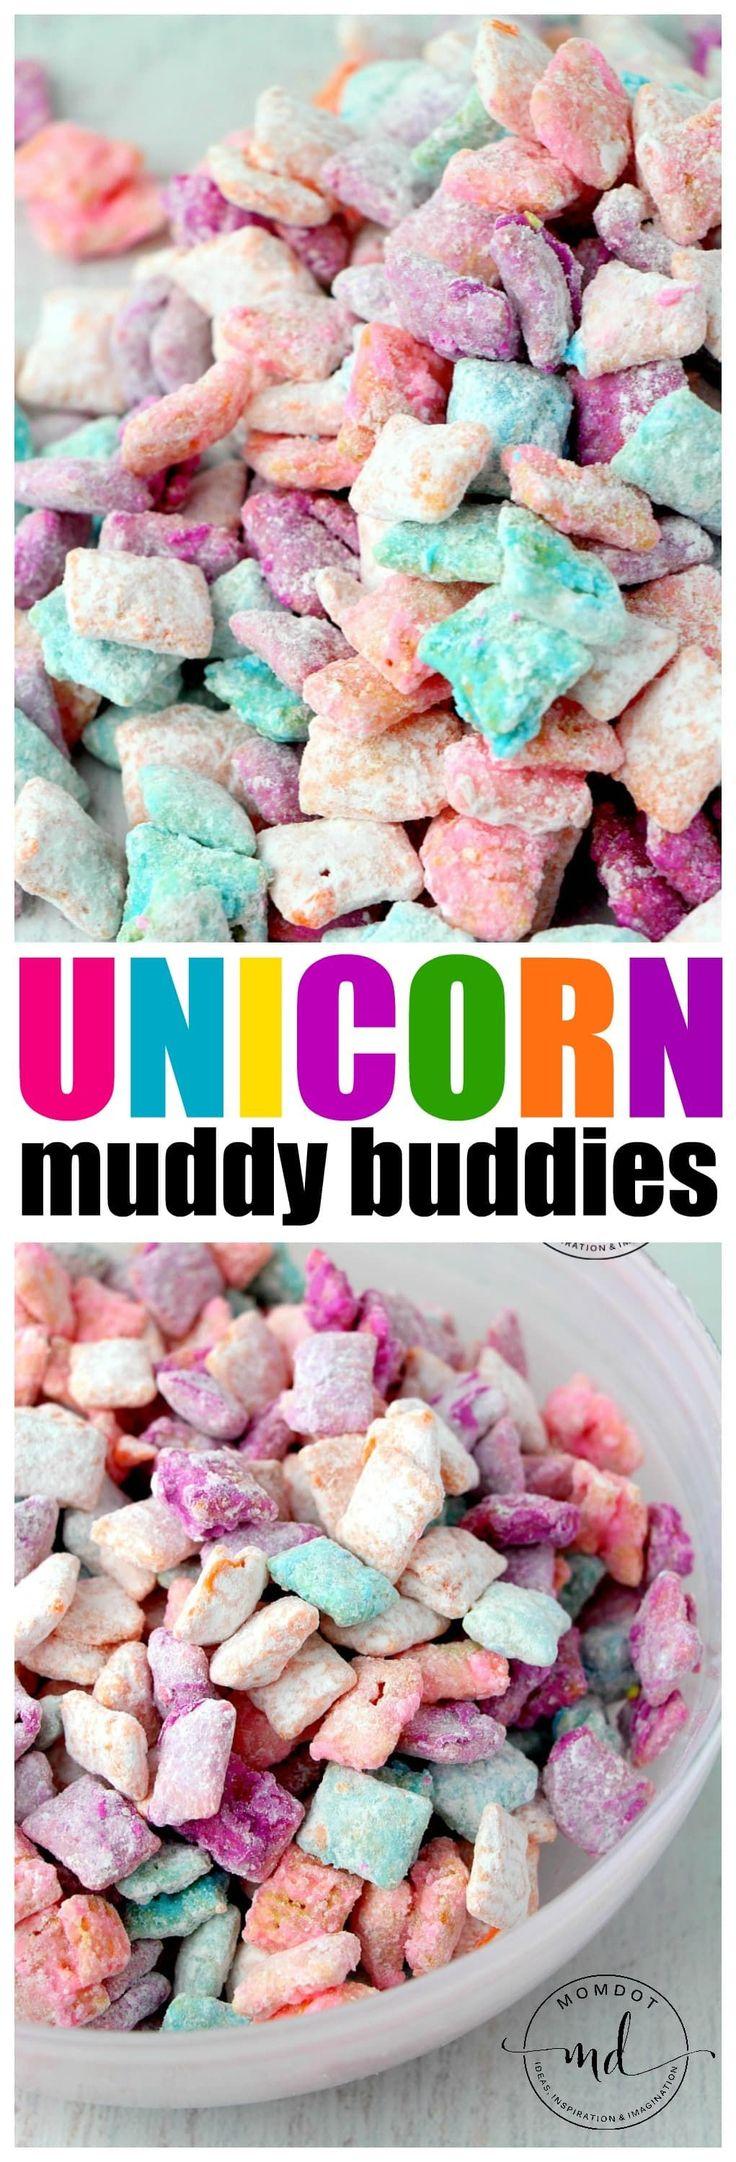 Unicorn Poop Muddy Buddies: Easy Chex Mix Muddy Buddy Recipe for a rainbow unico…